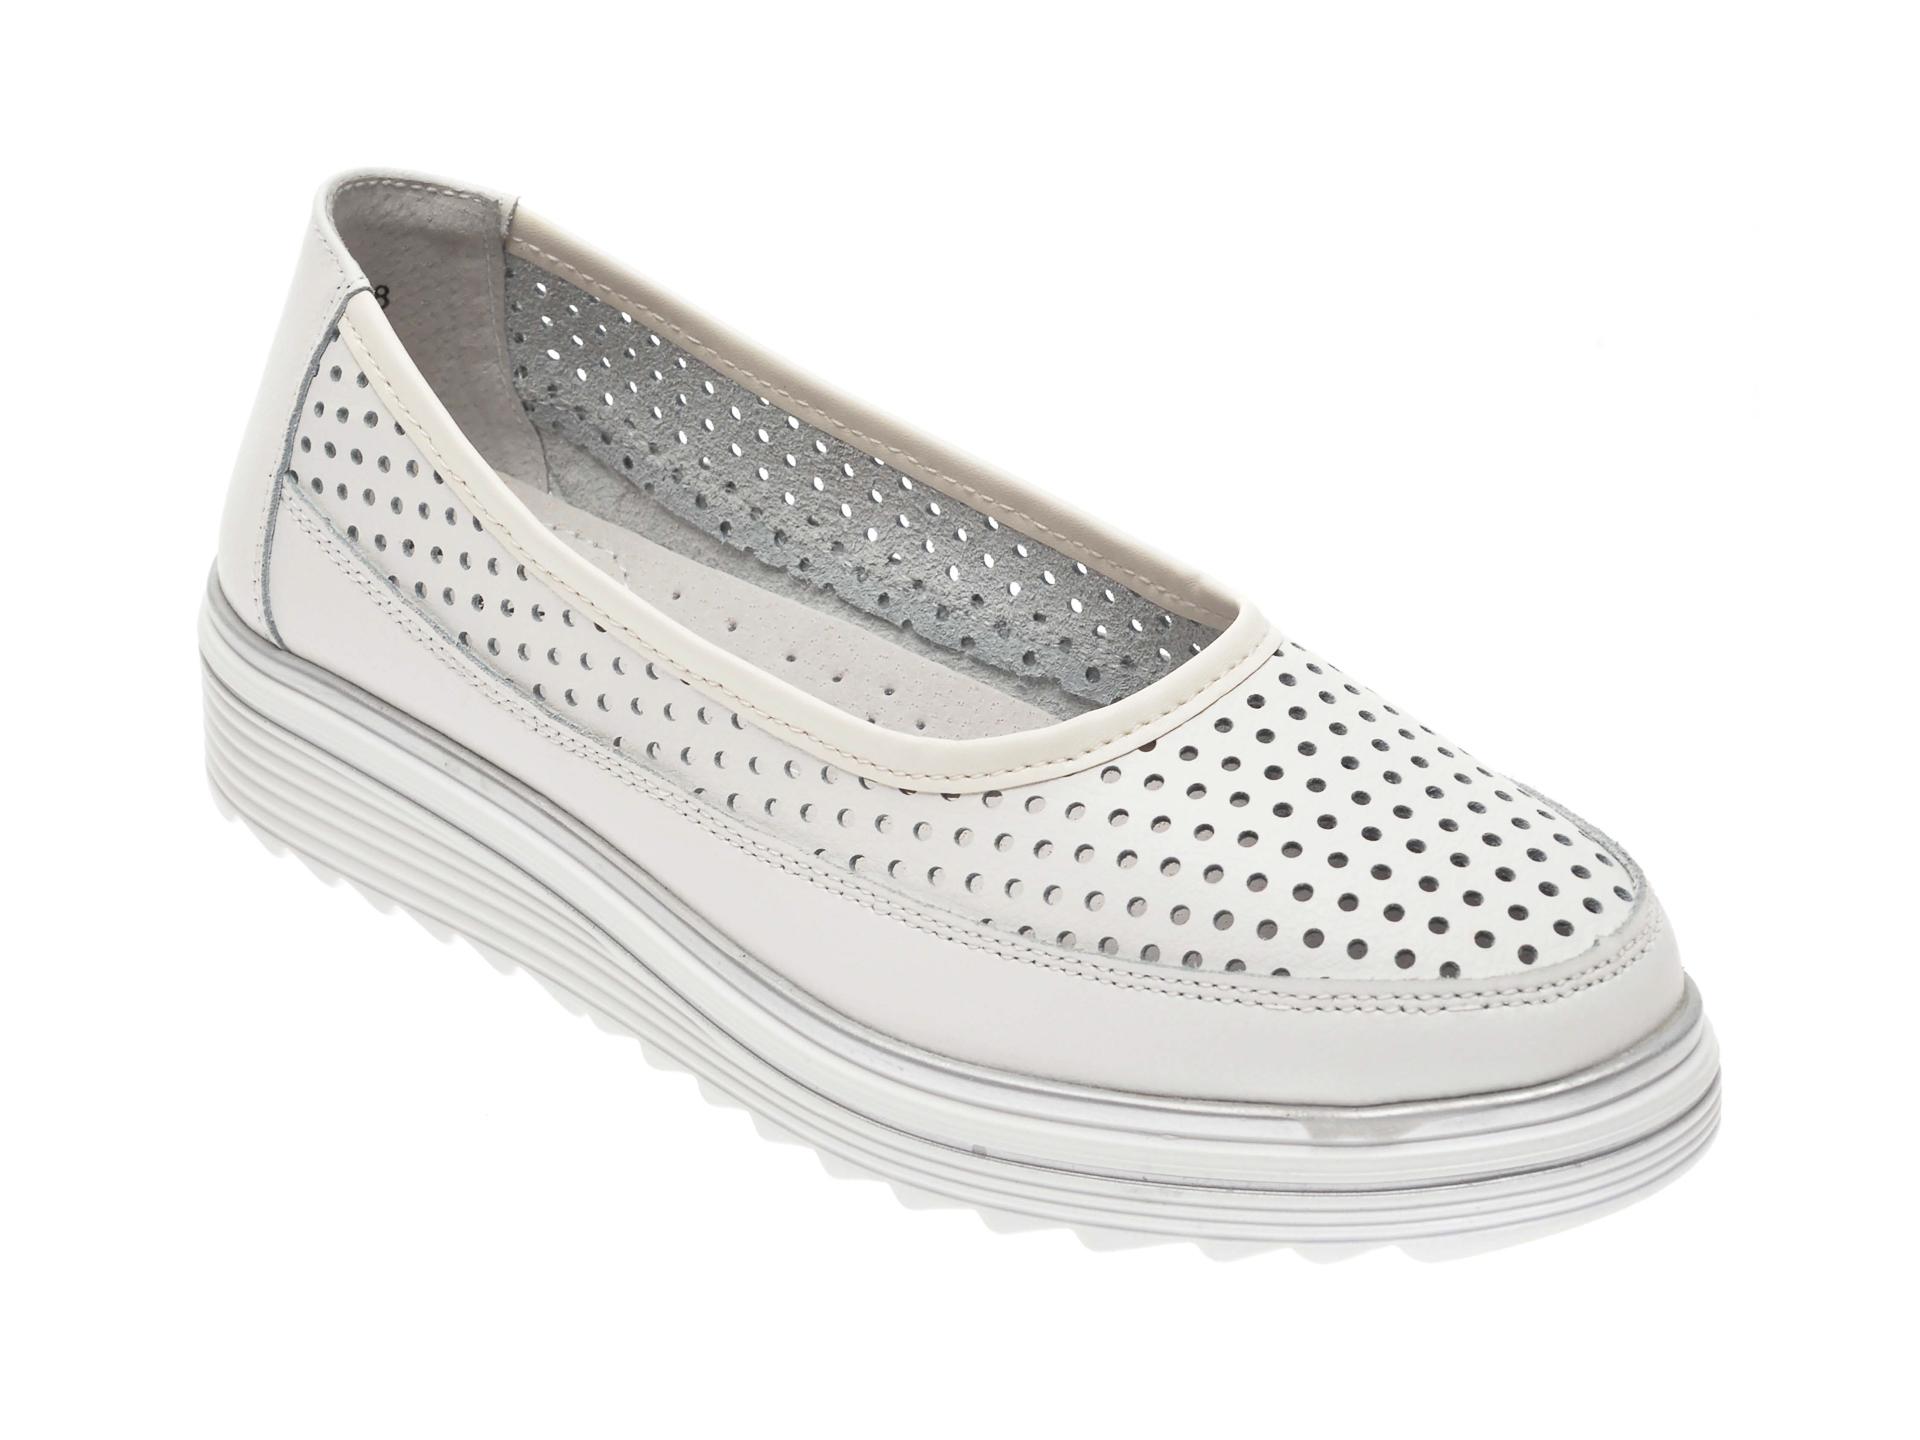 Pantofi IMAGE albi, 805, din piele naturala imagine